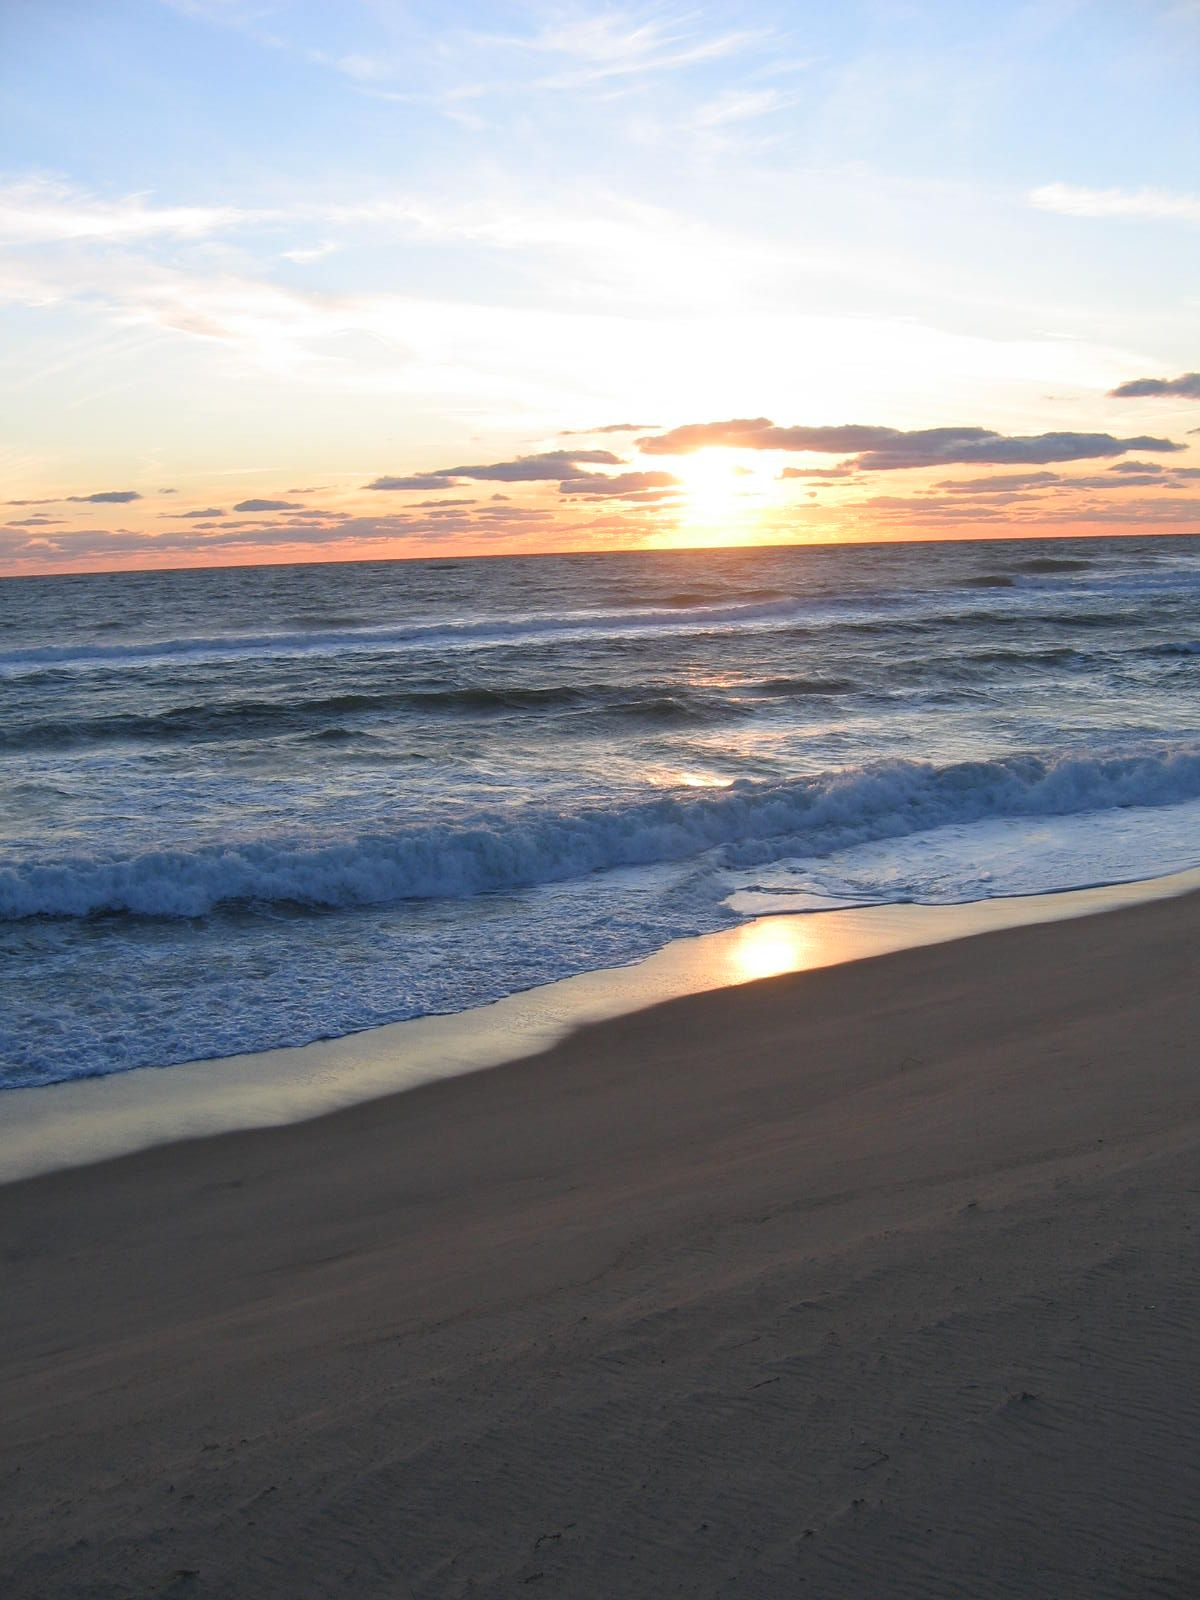 Cisco Beach - Nantucket's pristine beaches draw people ...